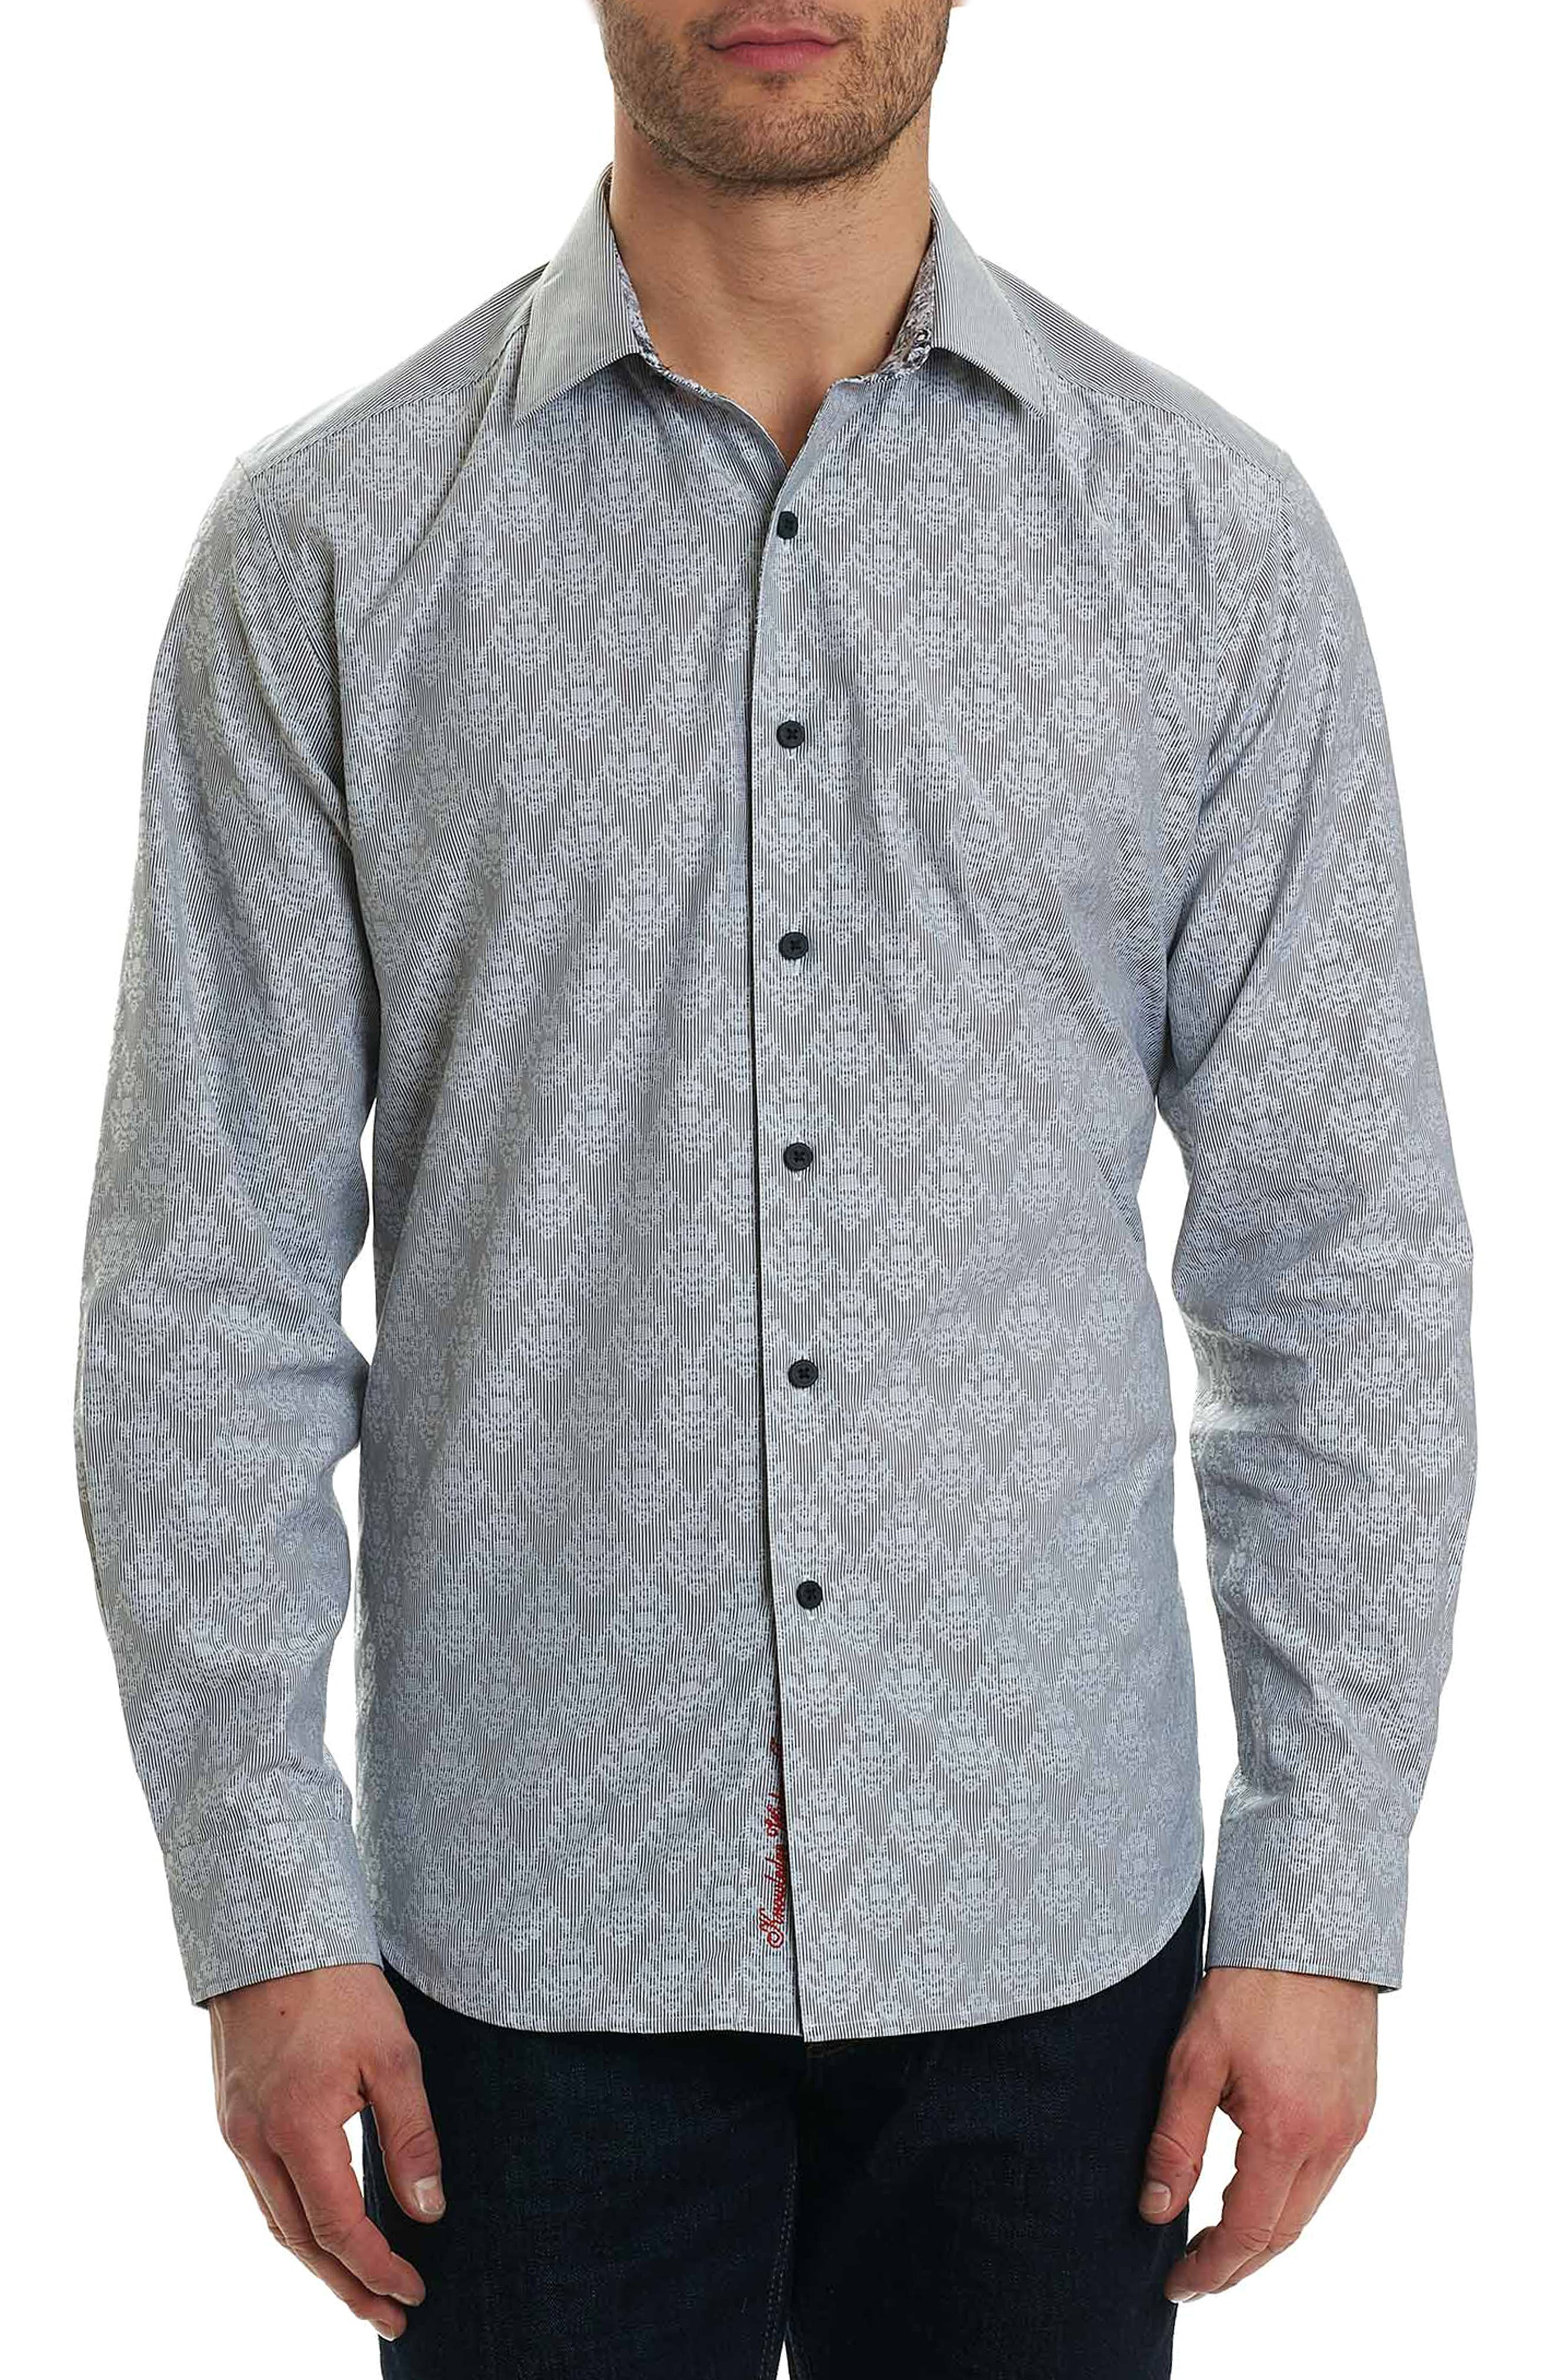 ROBERT GRAHAM Dynamo Regular Fit Sport Shirt, Main, color, 063